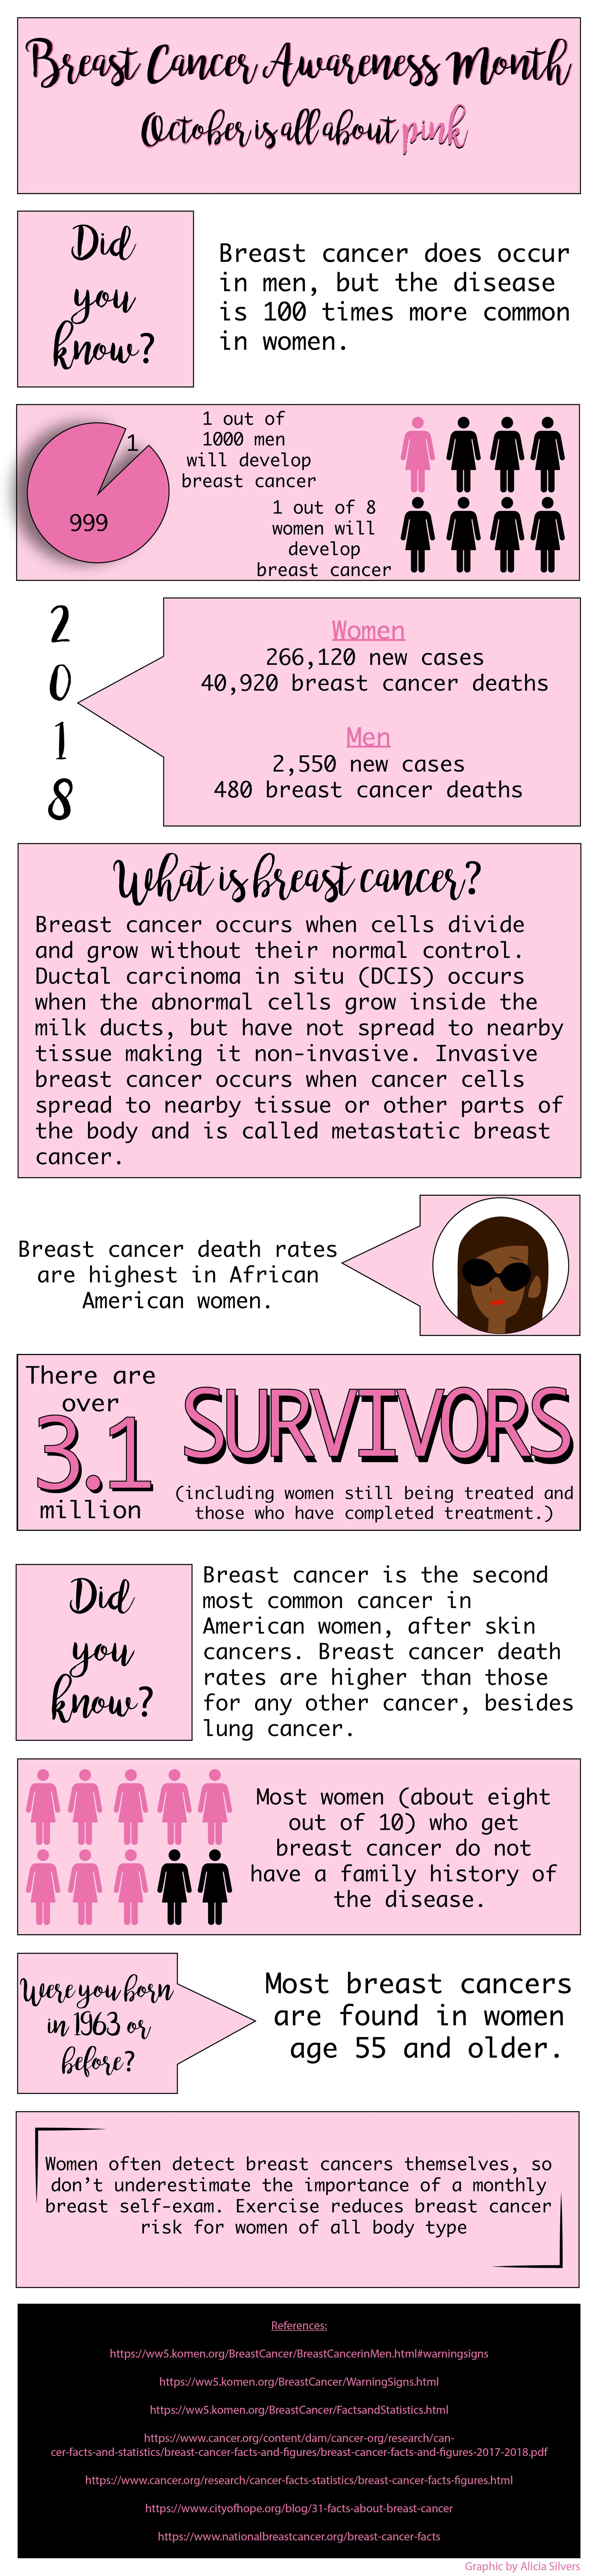 BreastCancerrevised-01.jpg